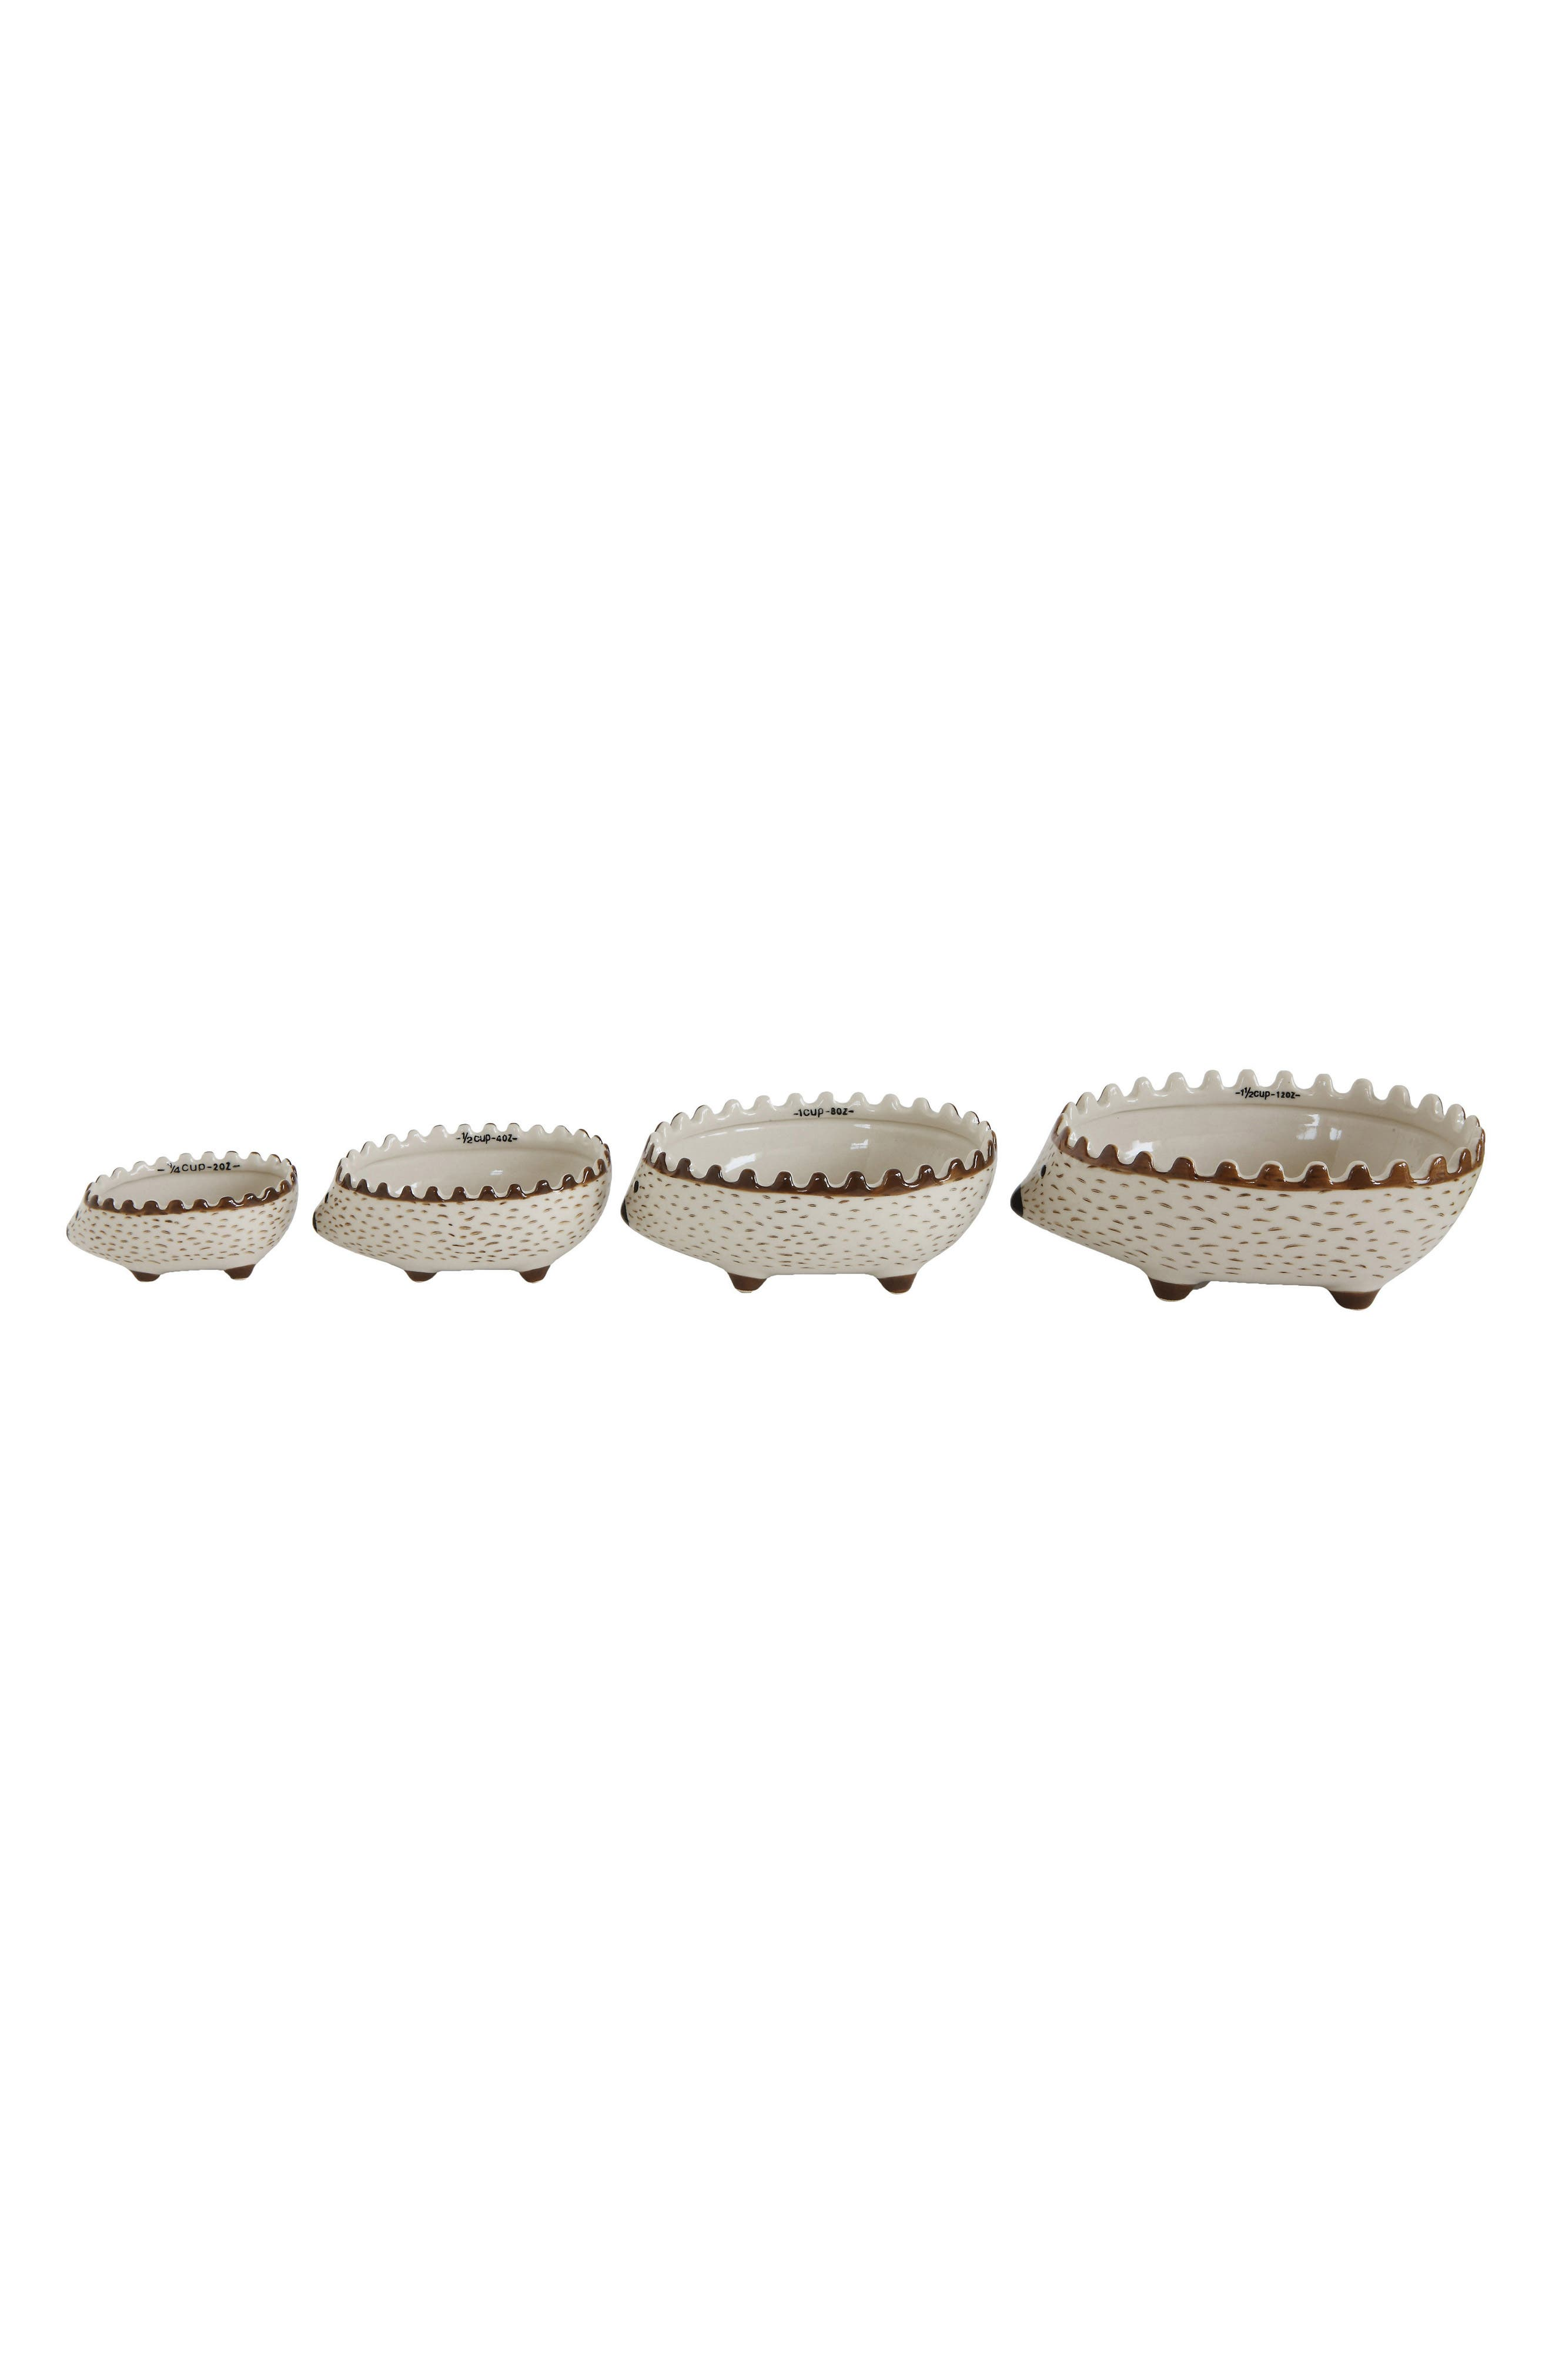 Set of 4 Hedgehog Measuring Cups,                             Main thumbnail 1, color,                             100